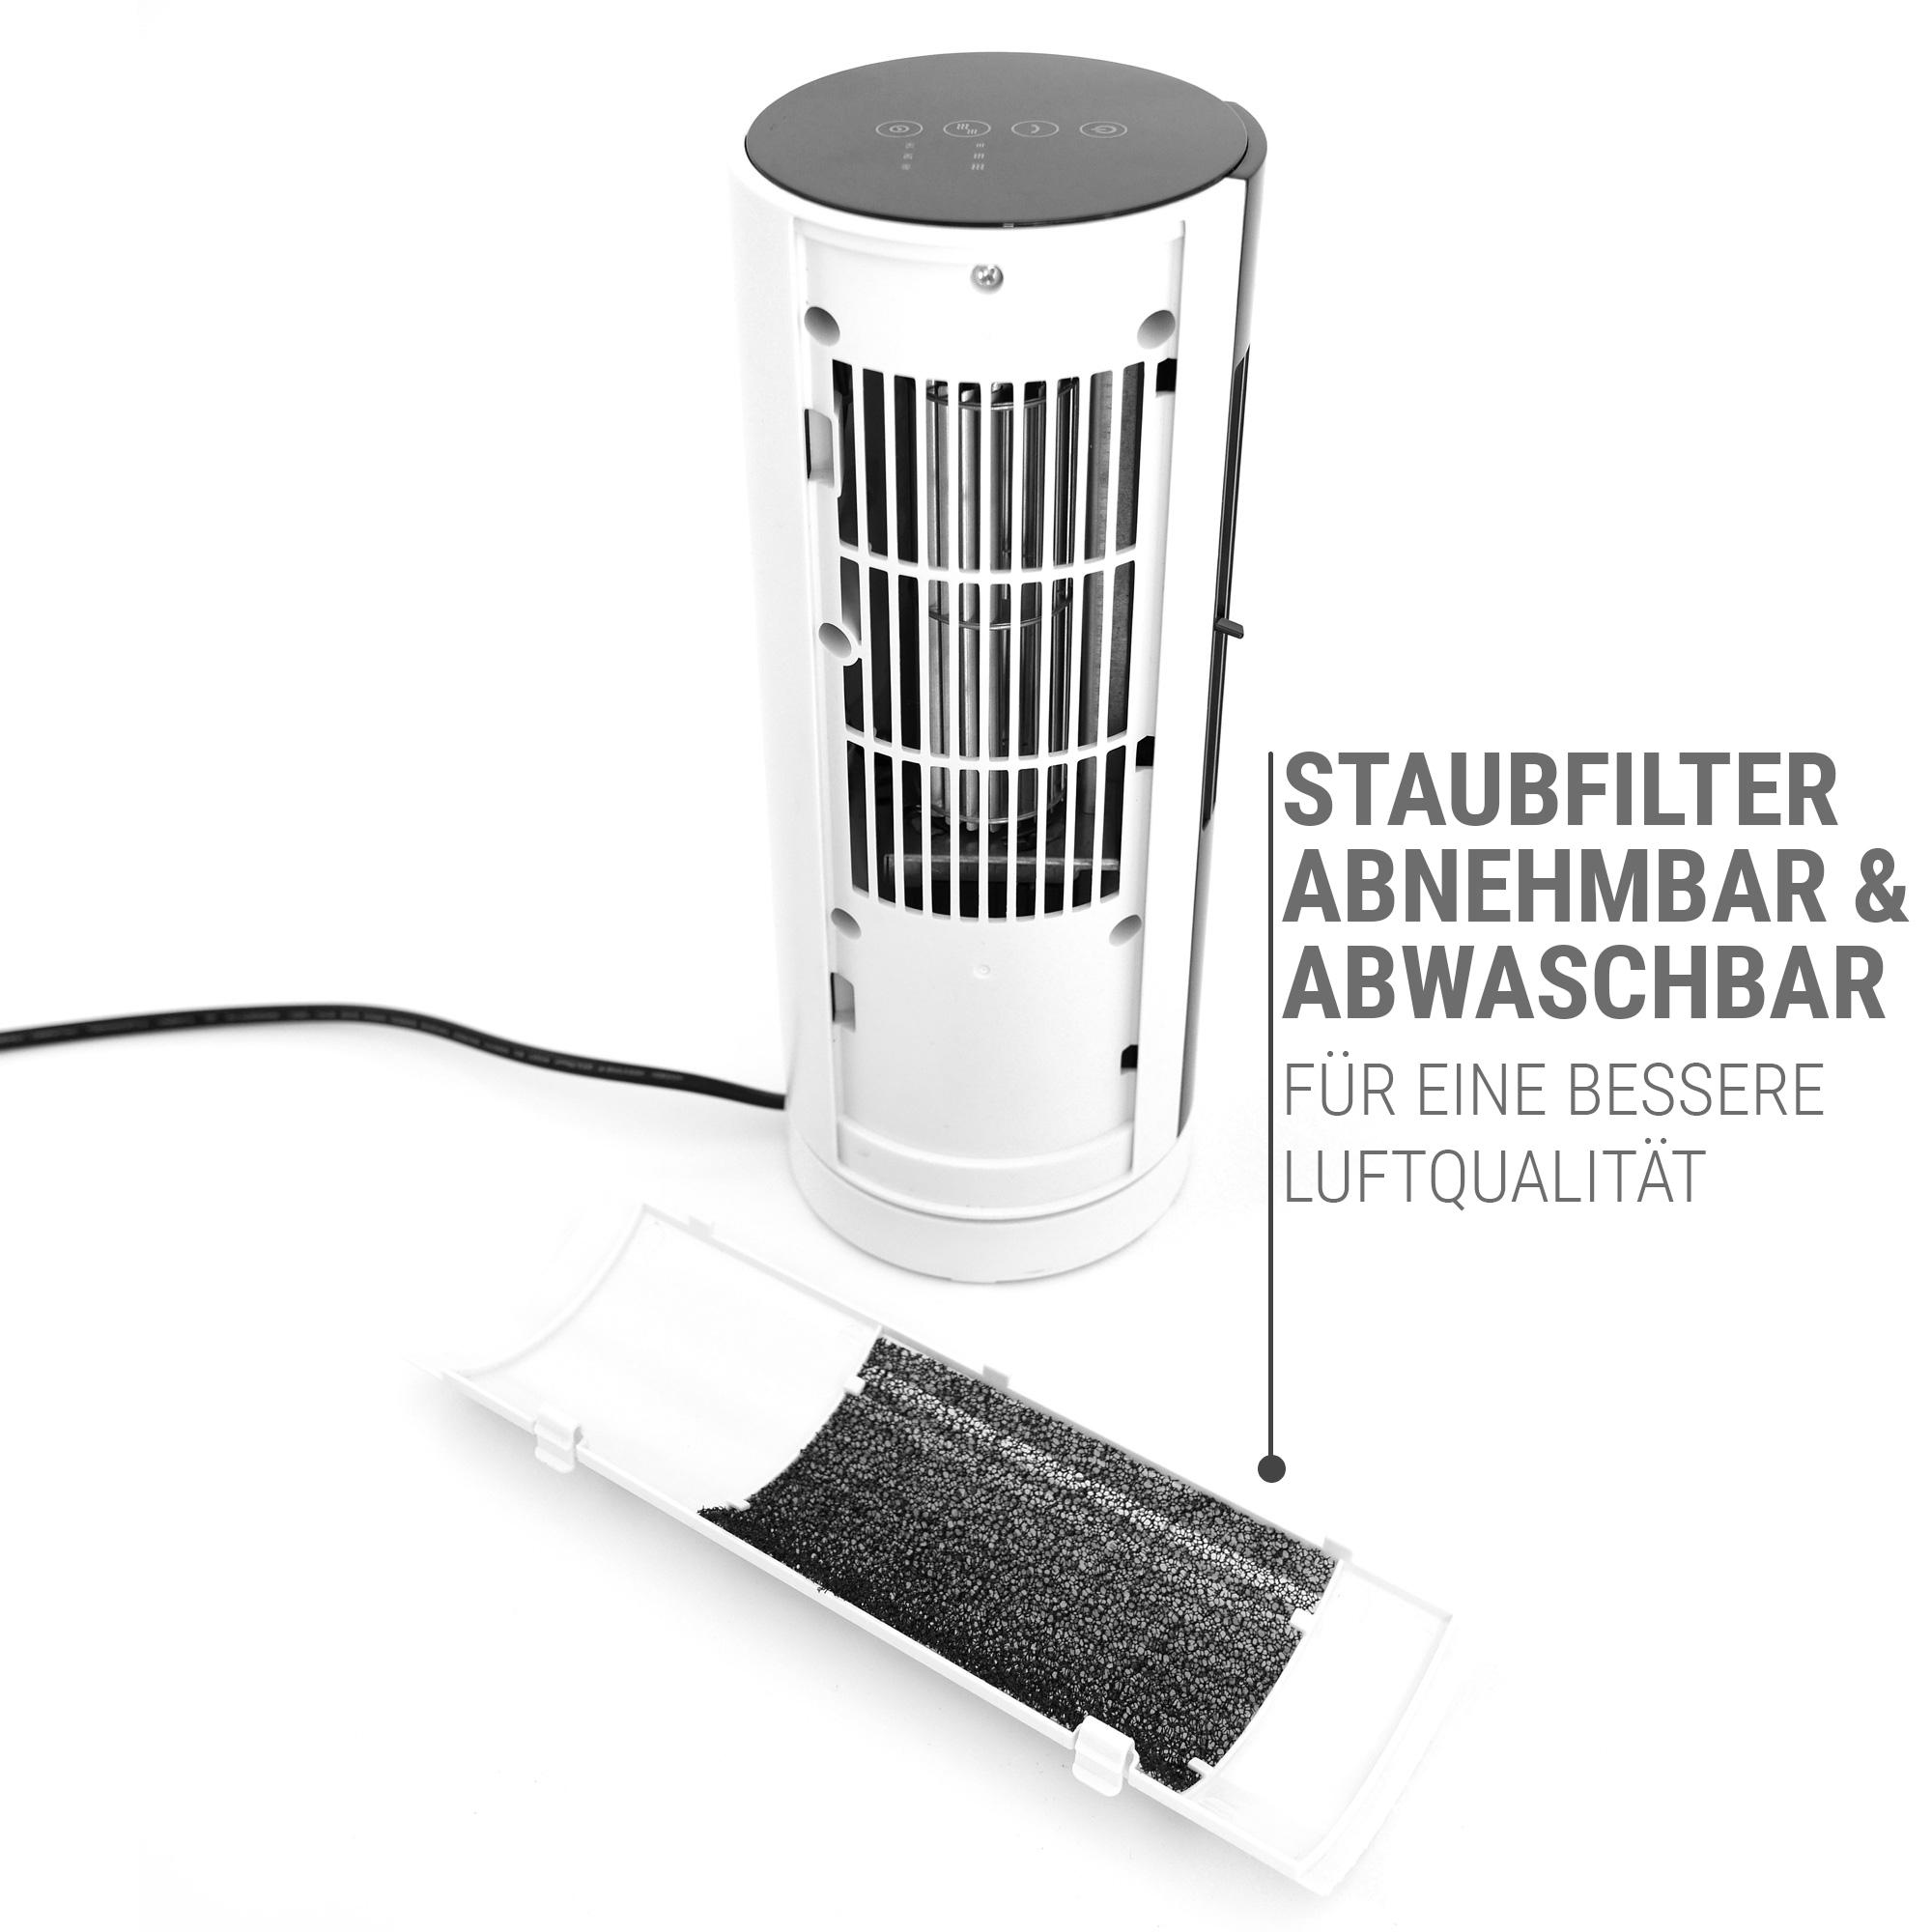 Turmventilator Vorteile Staubfilter, Oszillation, Timer